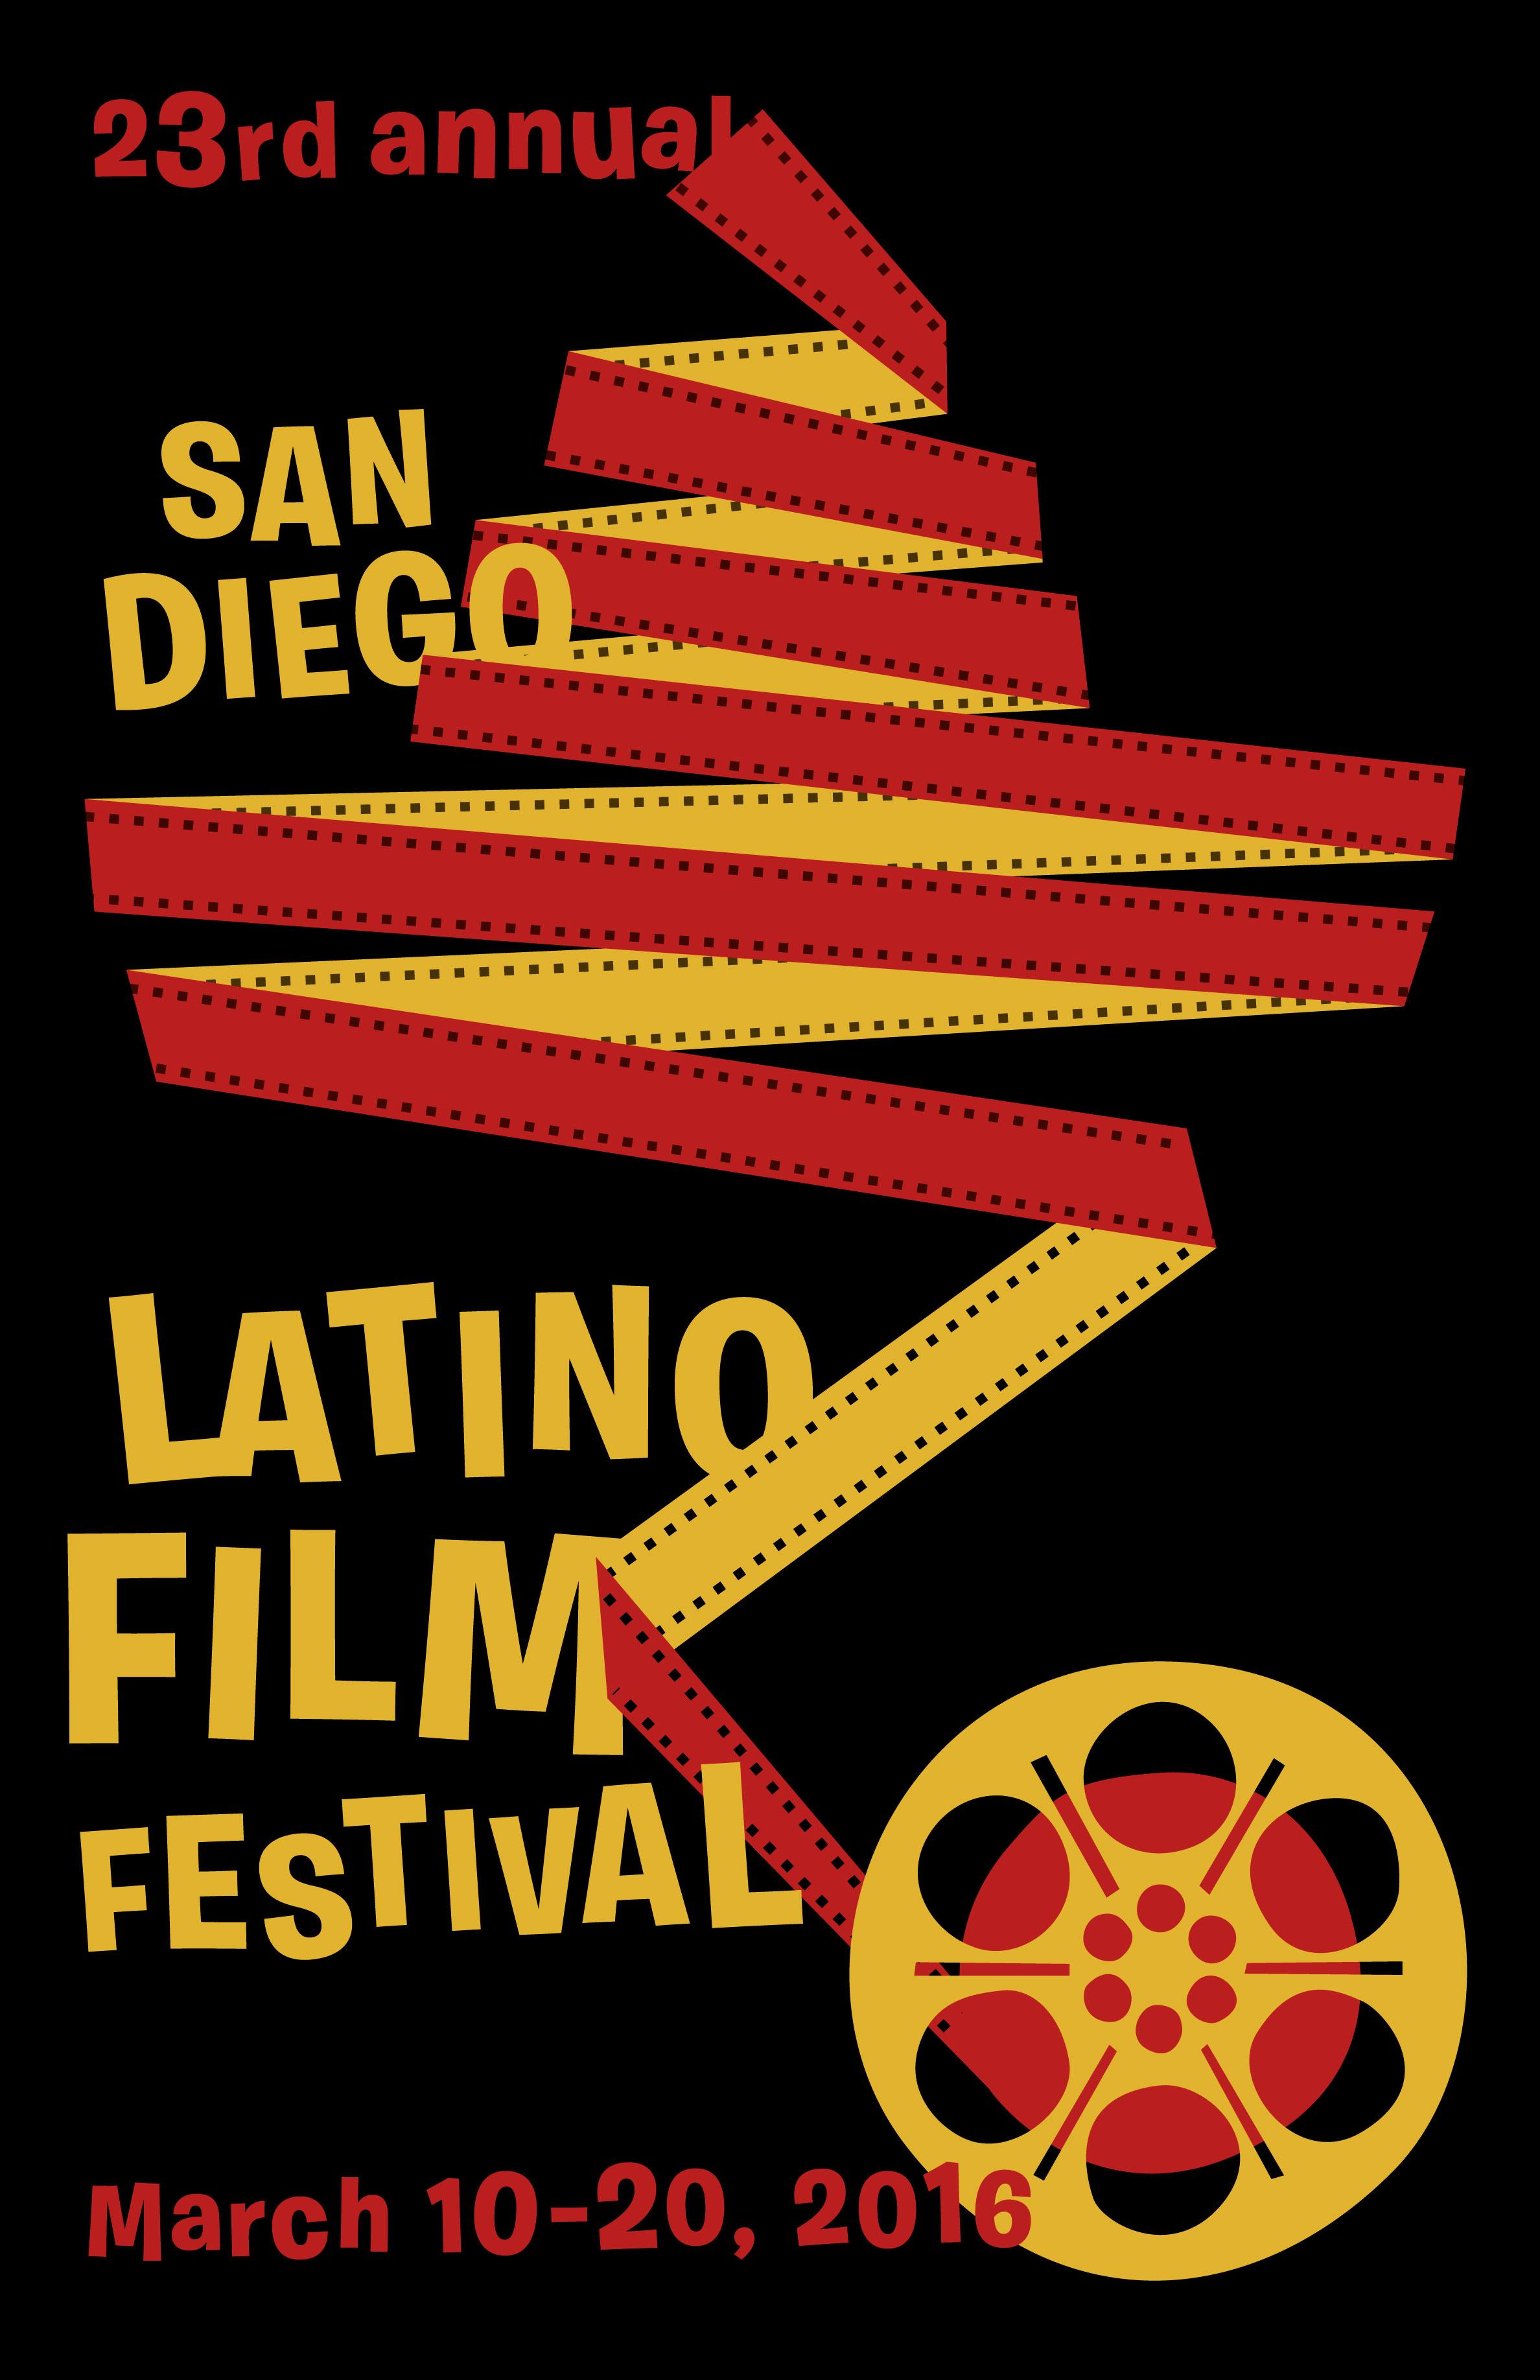 Kolja van Boekel Latino Film Festival sombrero